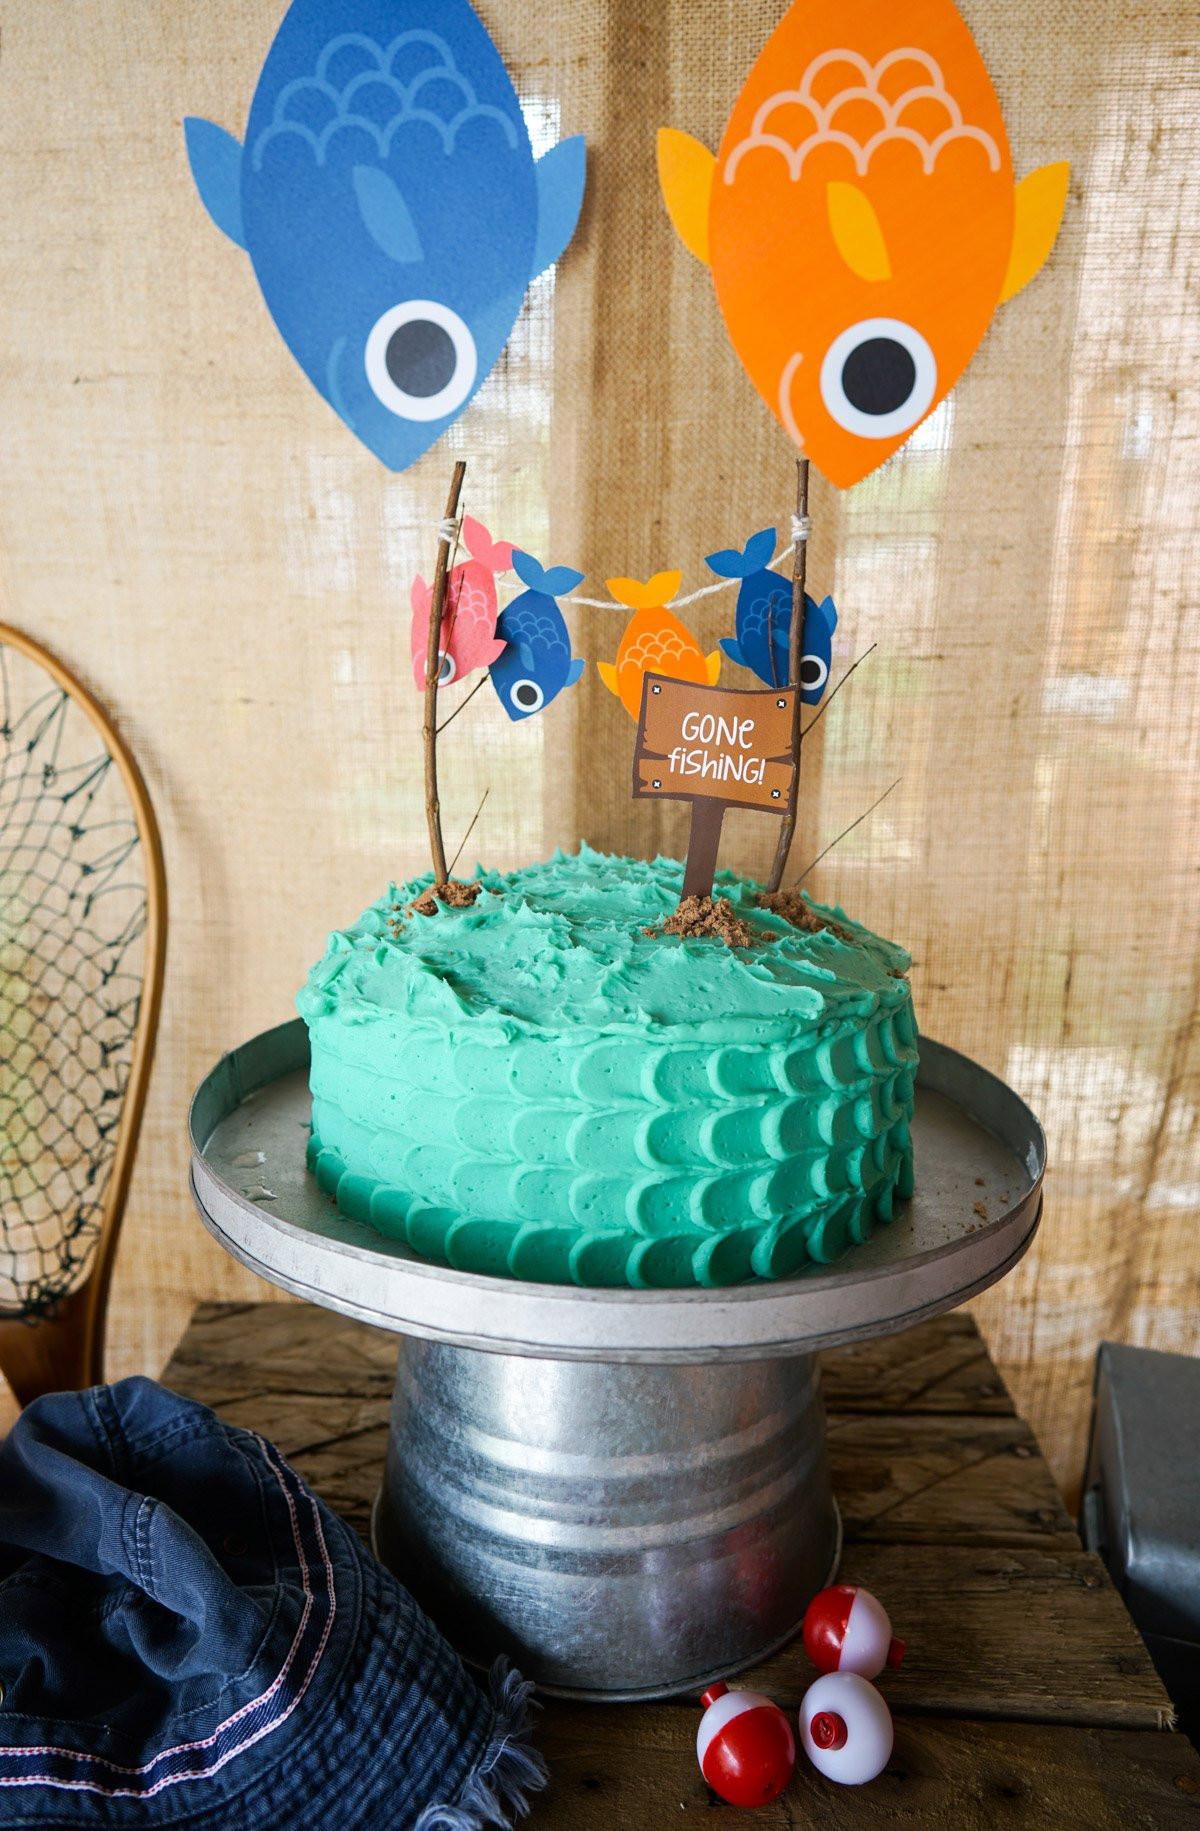 Fishing Birthday Cakes  William s Gone Fishing Party – Sunshine Parties